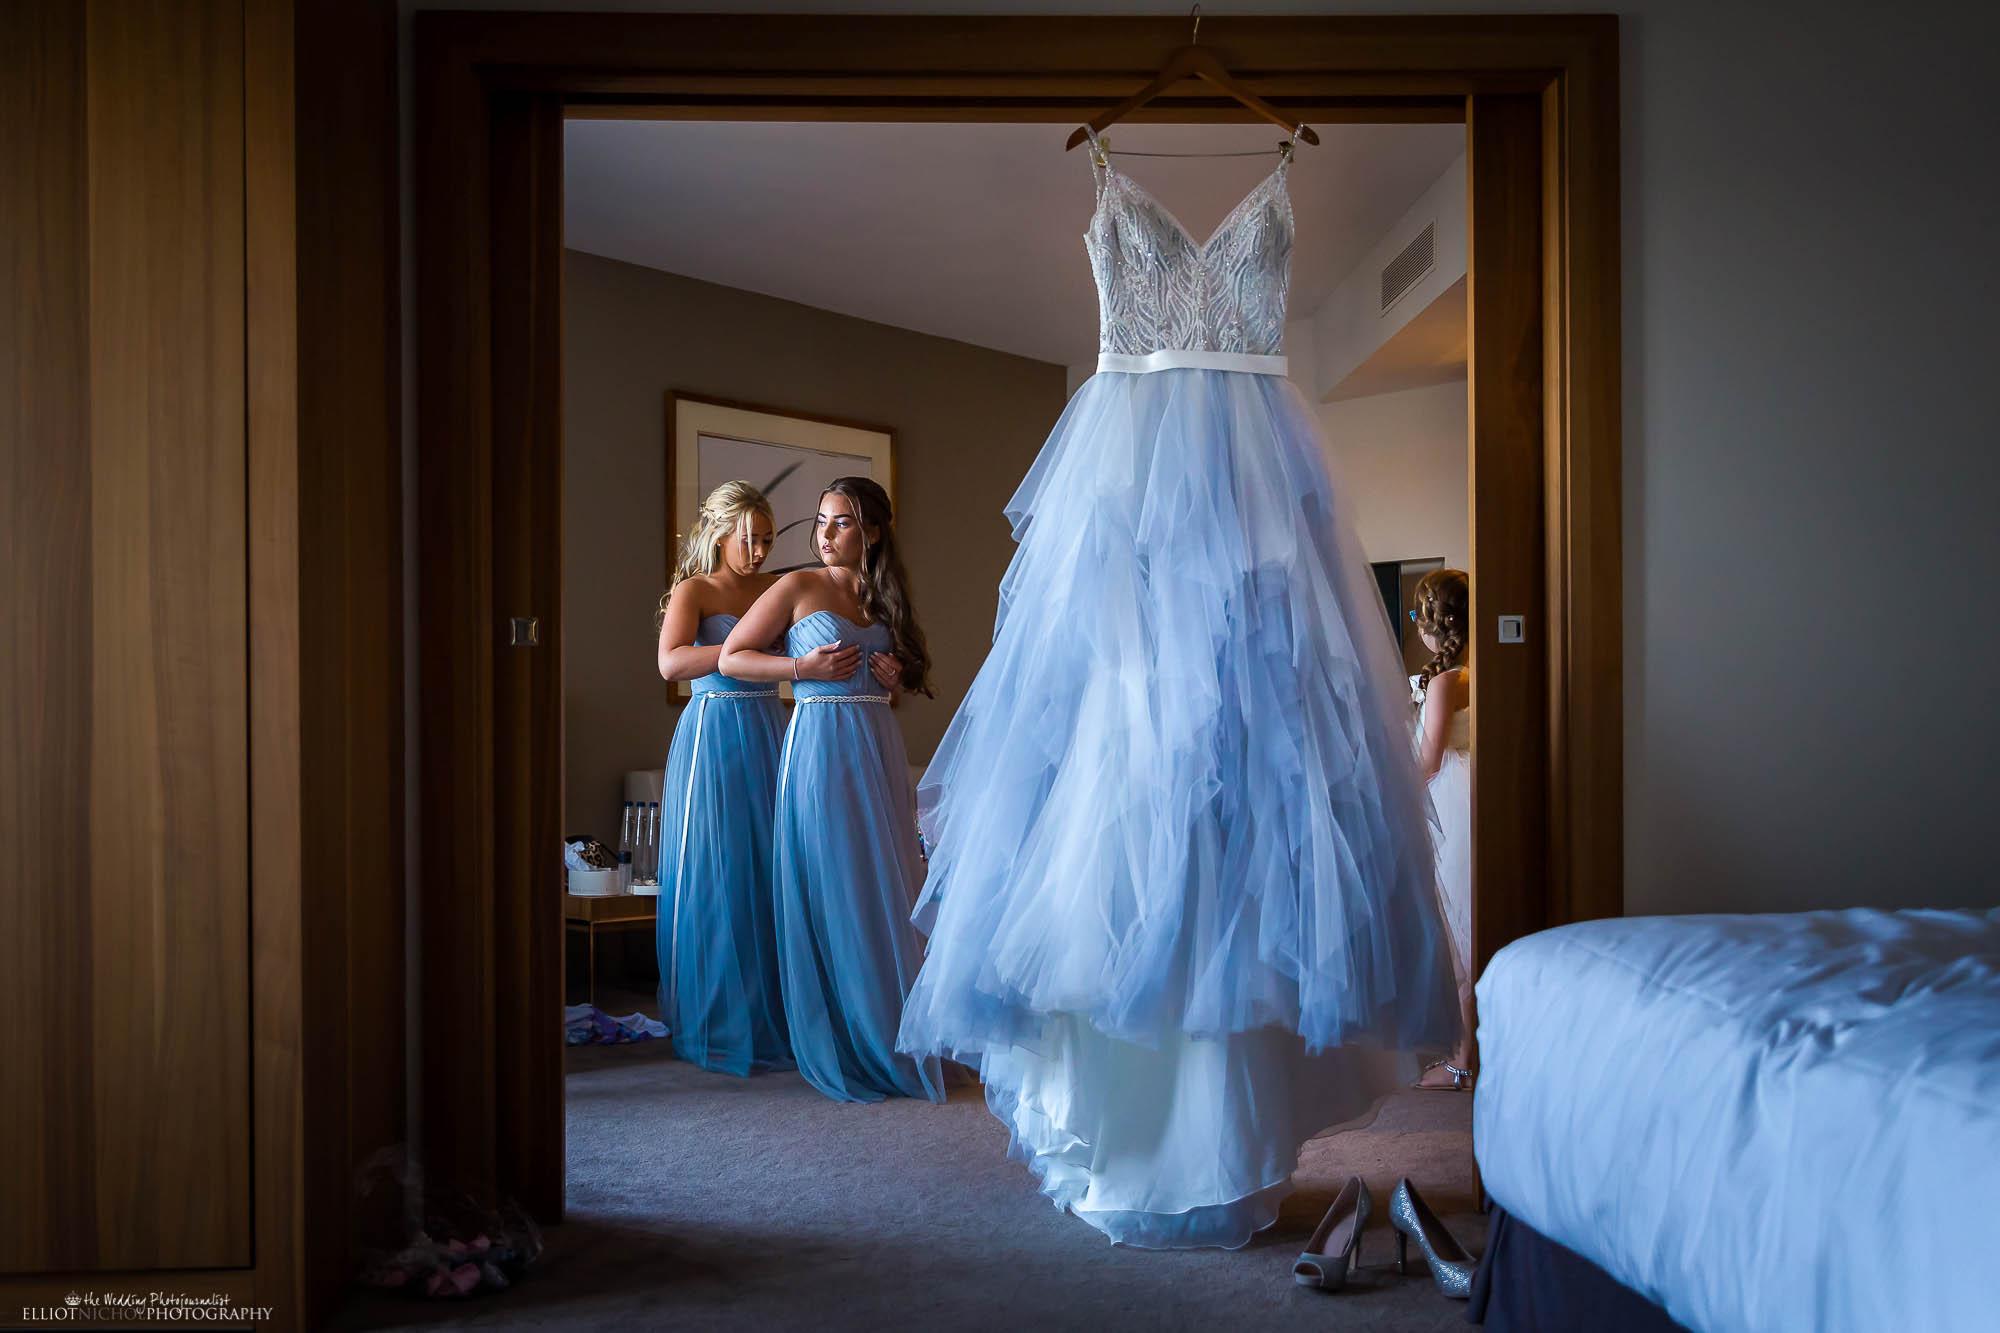 Bridesmaids getting ready next to brides blue wedding dress hanging in the room. Wedding photographer Elliot Nichol.